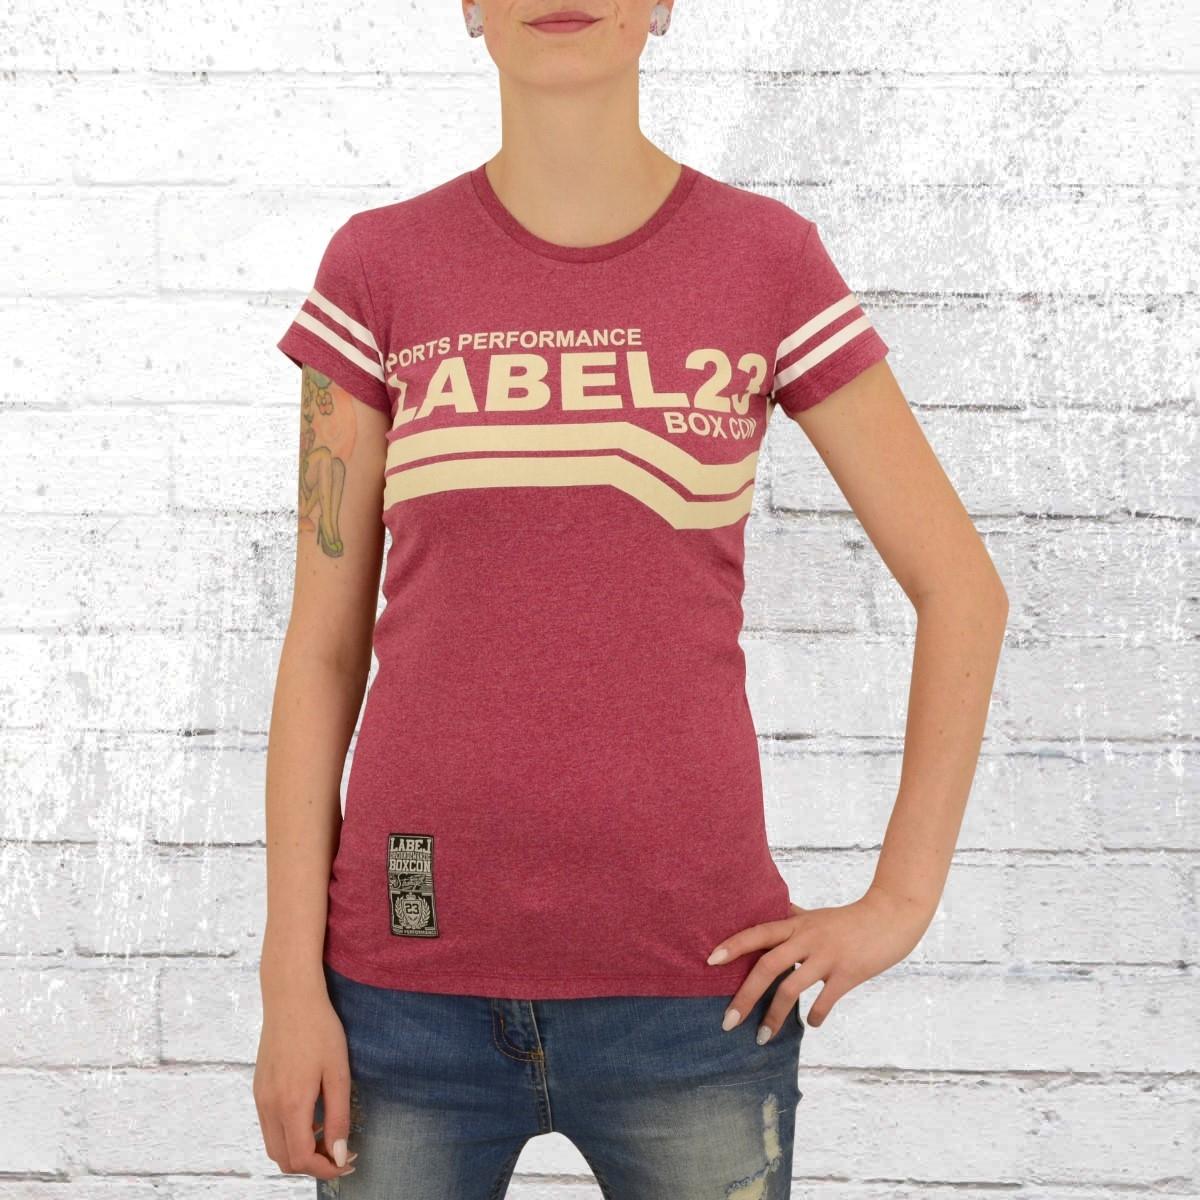 Label 23 Damen T-Shirt L23 Boxcon rot melange